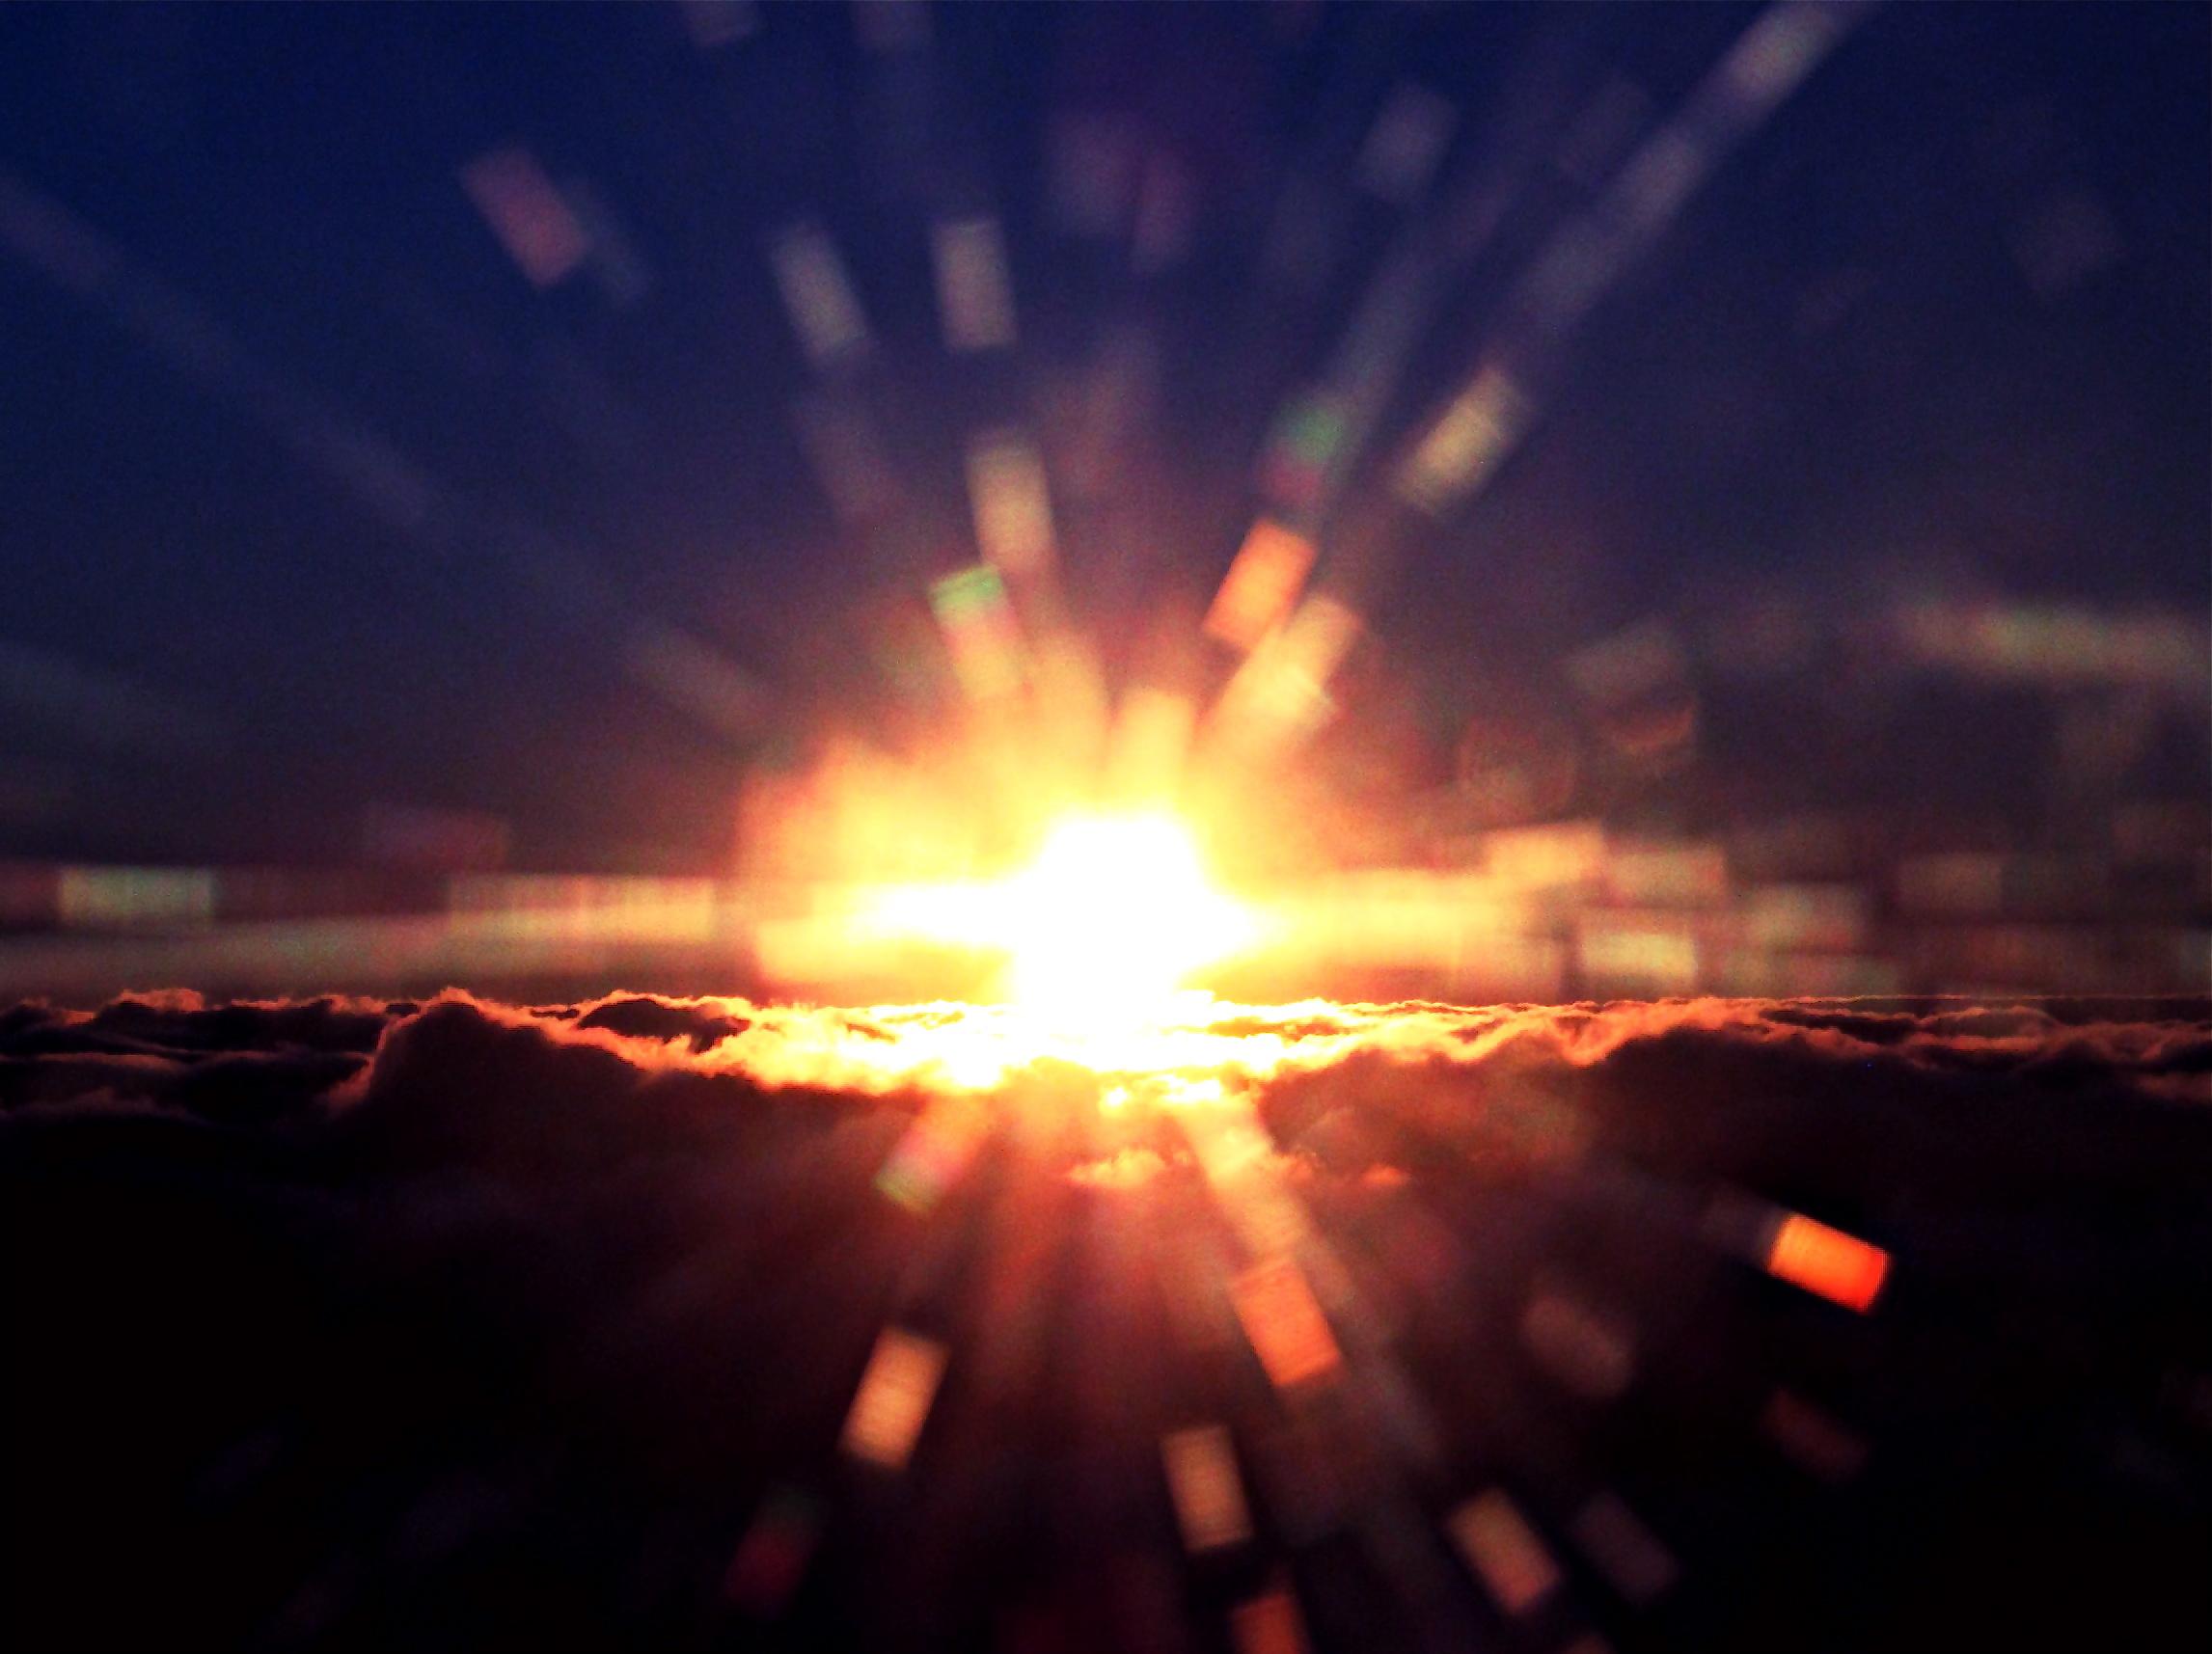 Beautiful Wallpaper Music Bright - sunlight-sunset-night-space-sky-purple-clouds-Earth-music-sunrise-evening-morning-flying-musician-Sun-orange-horizon-atmosphere-bright-campfire-light-cloud-dawn-darkness-daytime-brightsun-computer-wallpaper-atmosphere-of-earth-afterglow-geological-phenomenon-beautifulsunrise-phenomenon-purplesky-mattbrouwer-incrediblesunrise-capturecreation-flecksofcolor-tillthesunrise-mattbrouwernewalbum-fromtheairsunrise-881260  Trends_472182.jpg